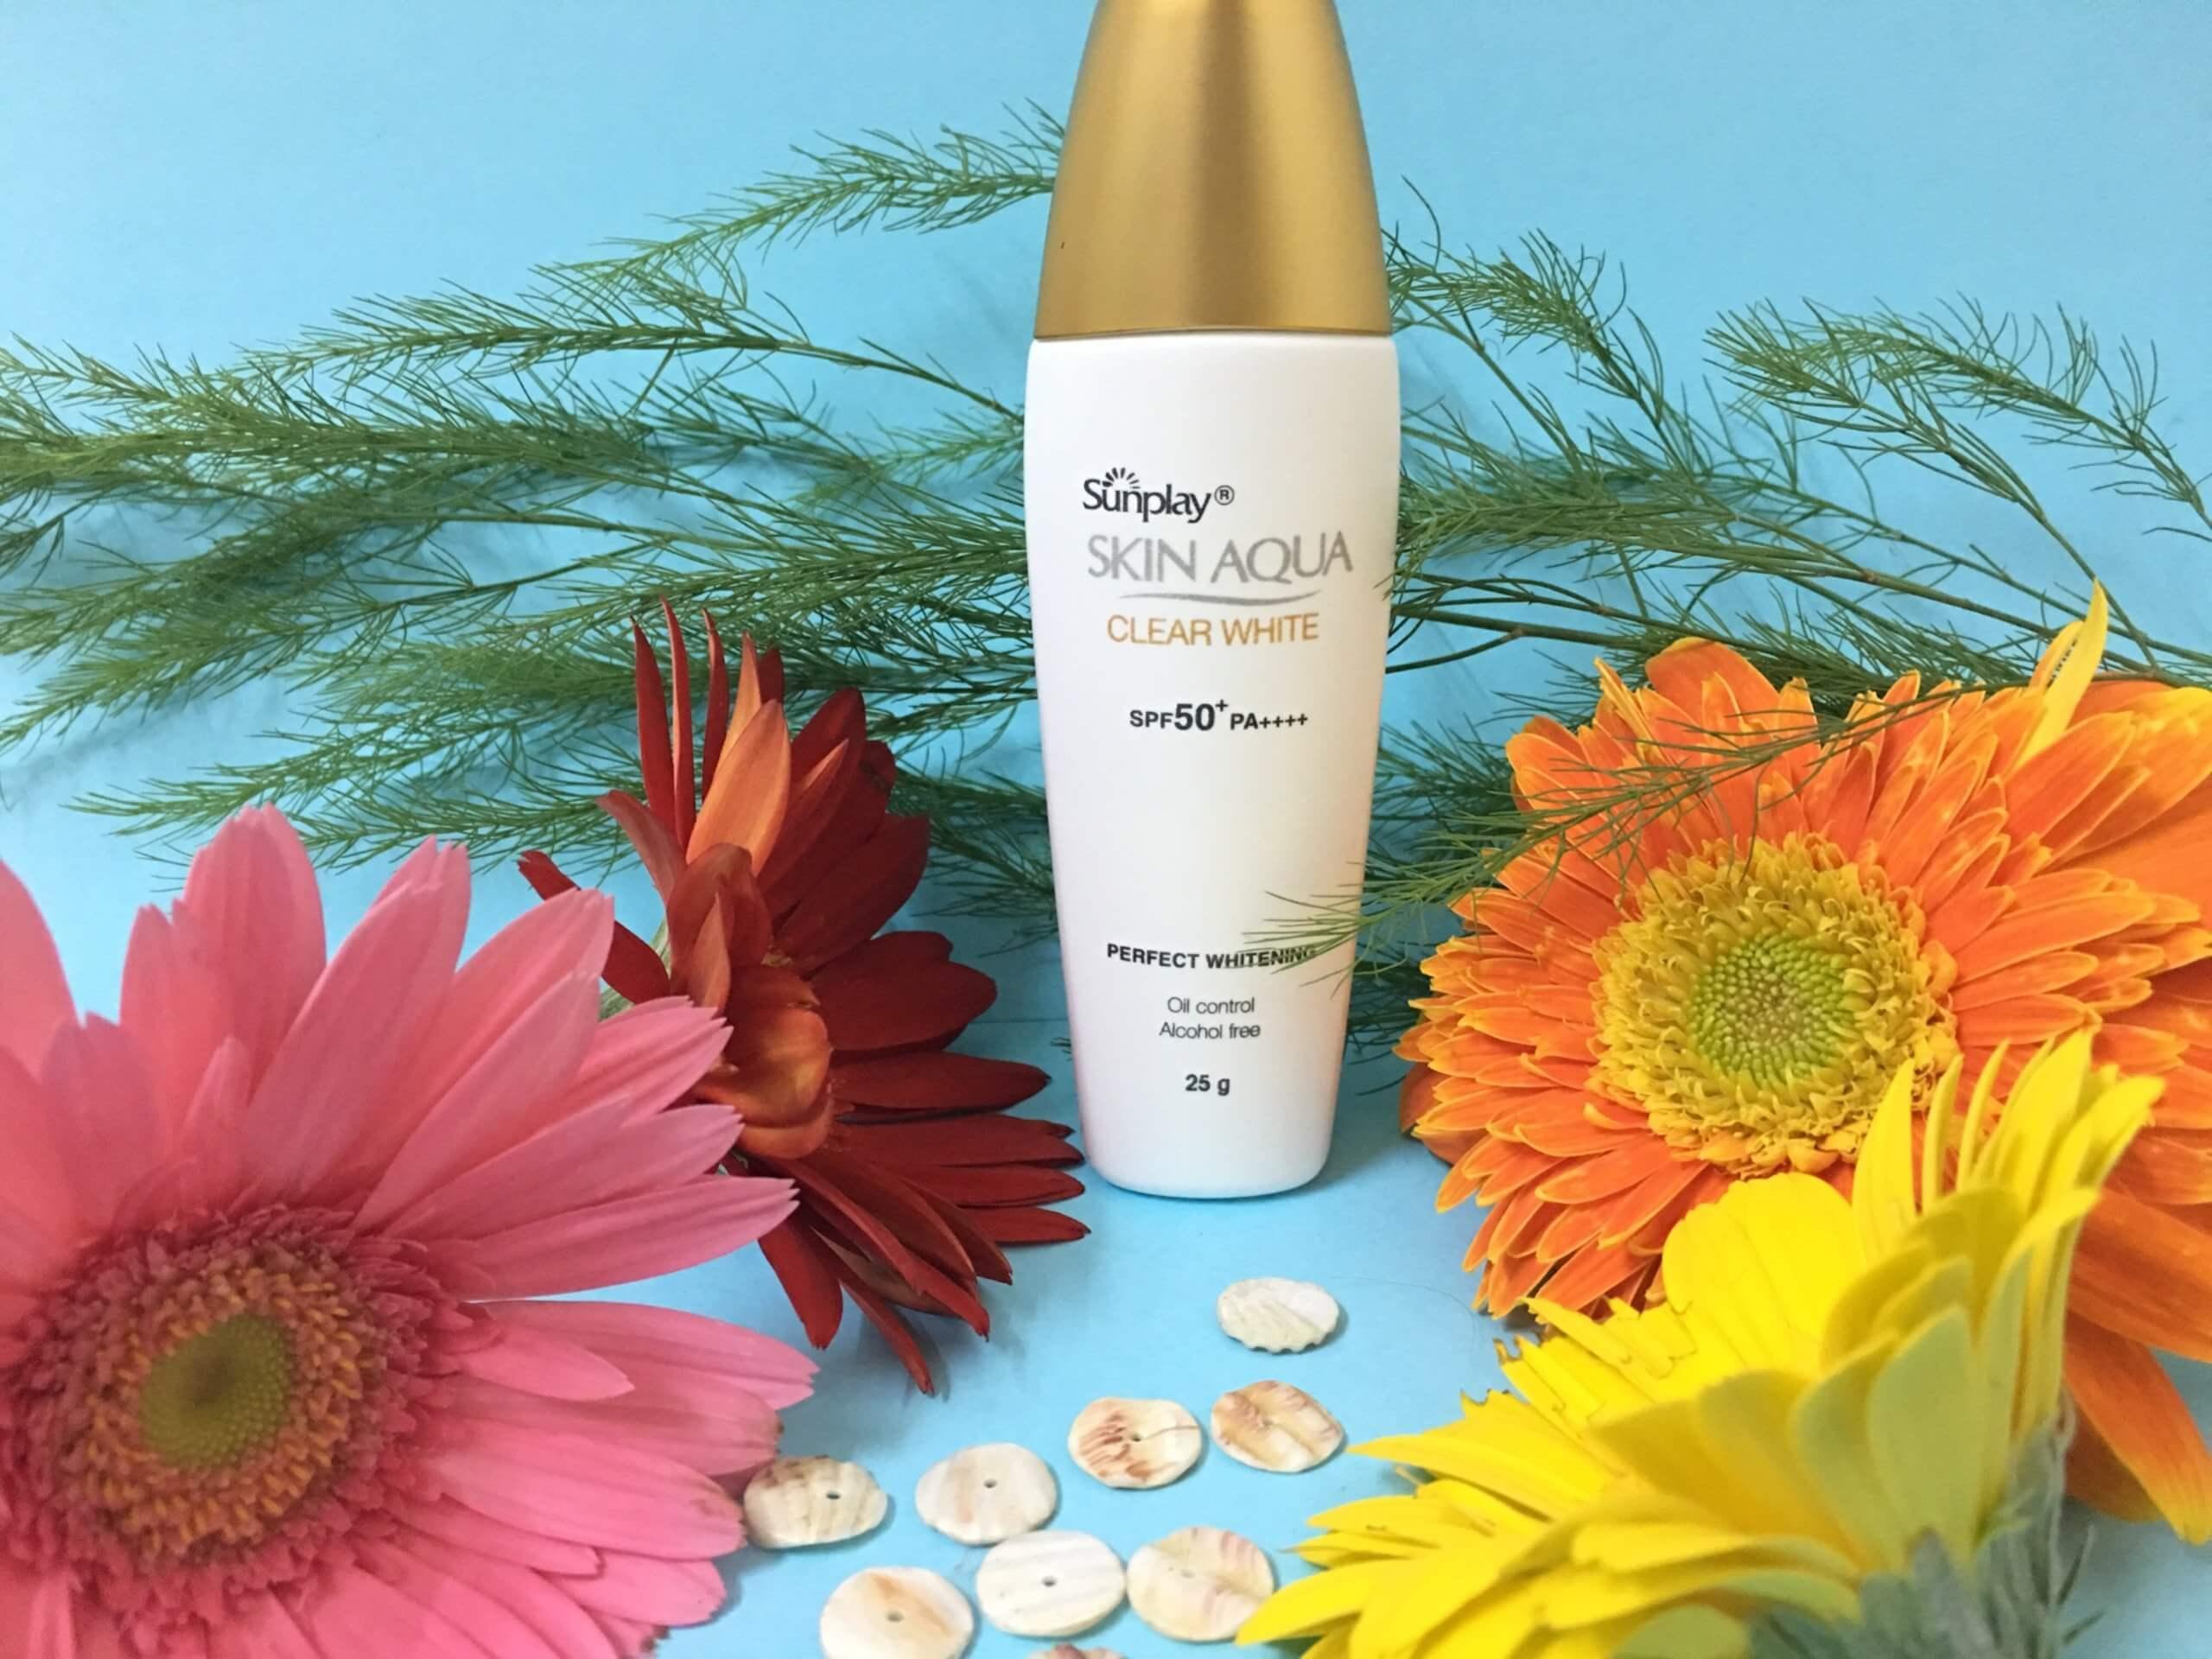 Kem chống nắng Sunplay Skin Aqua Clear White